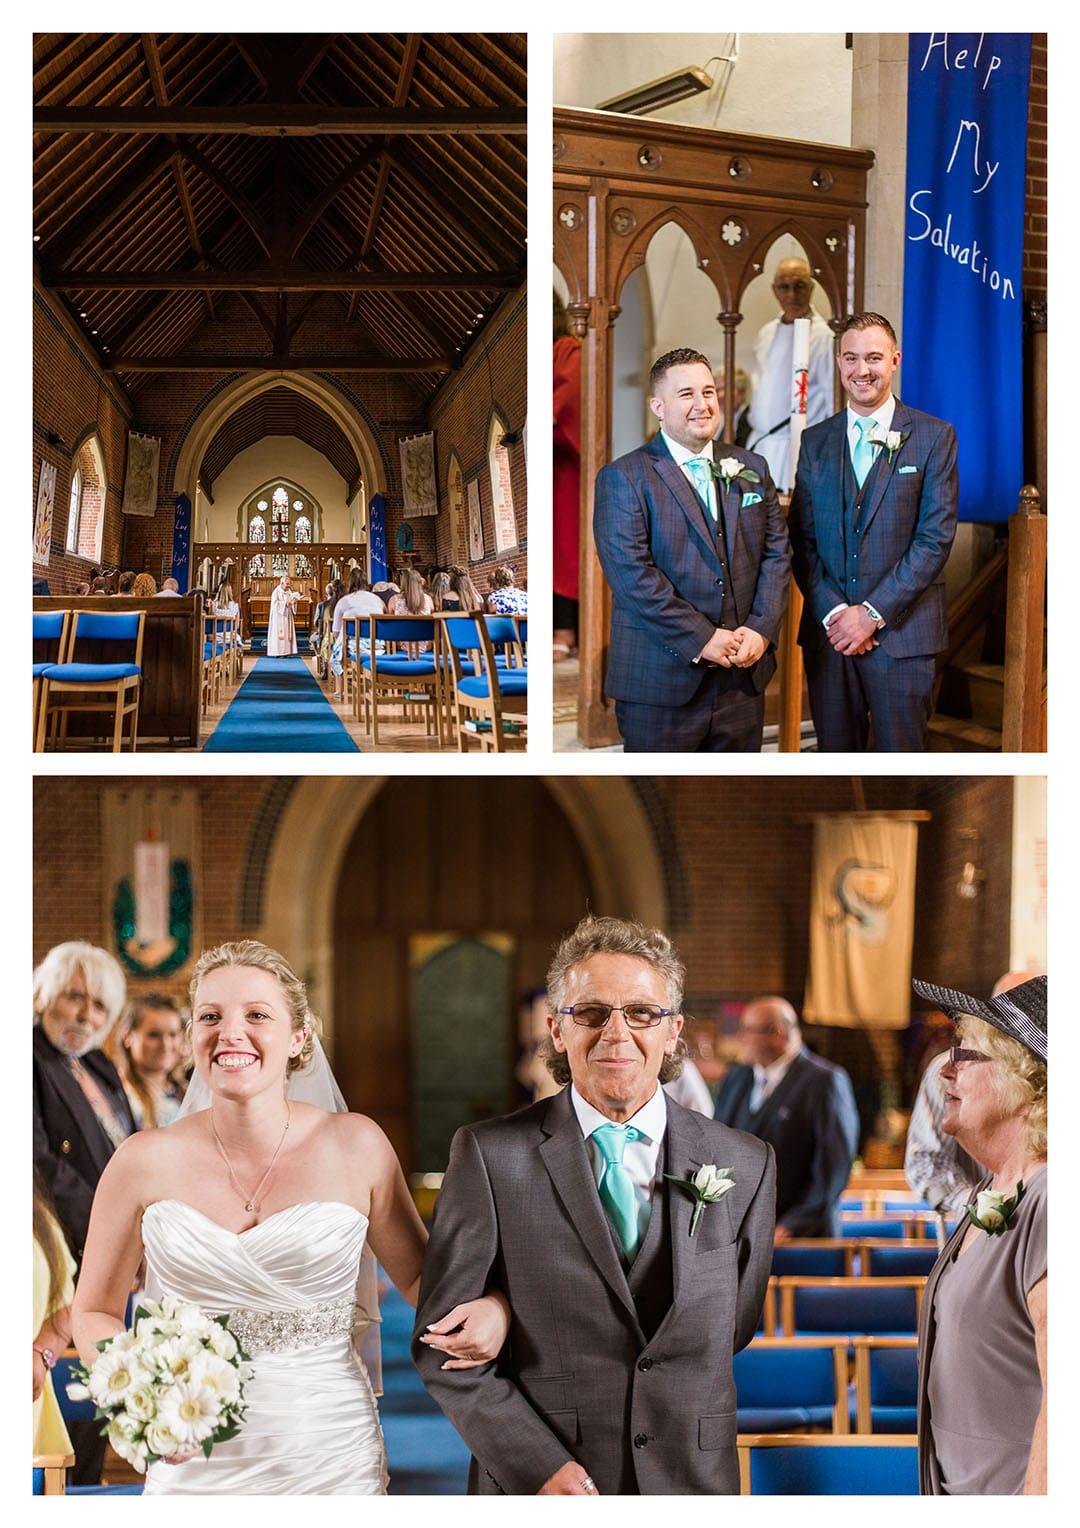 St Michaels Church Partridge Green Wedding Ceremony